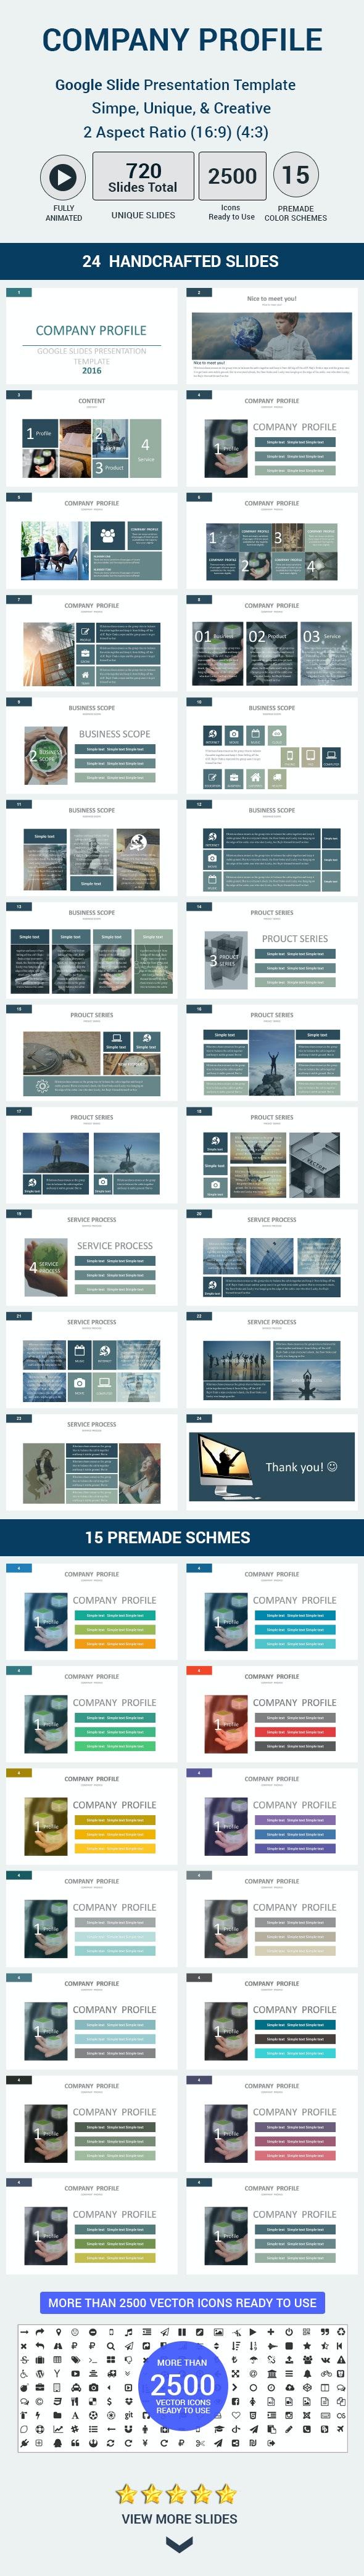 Company profile Google Slides Presentation Template - Google Slides Presentation Templates